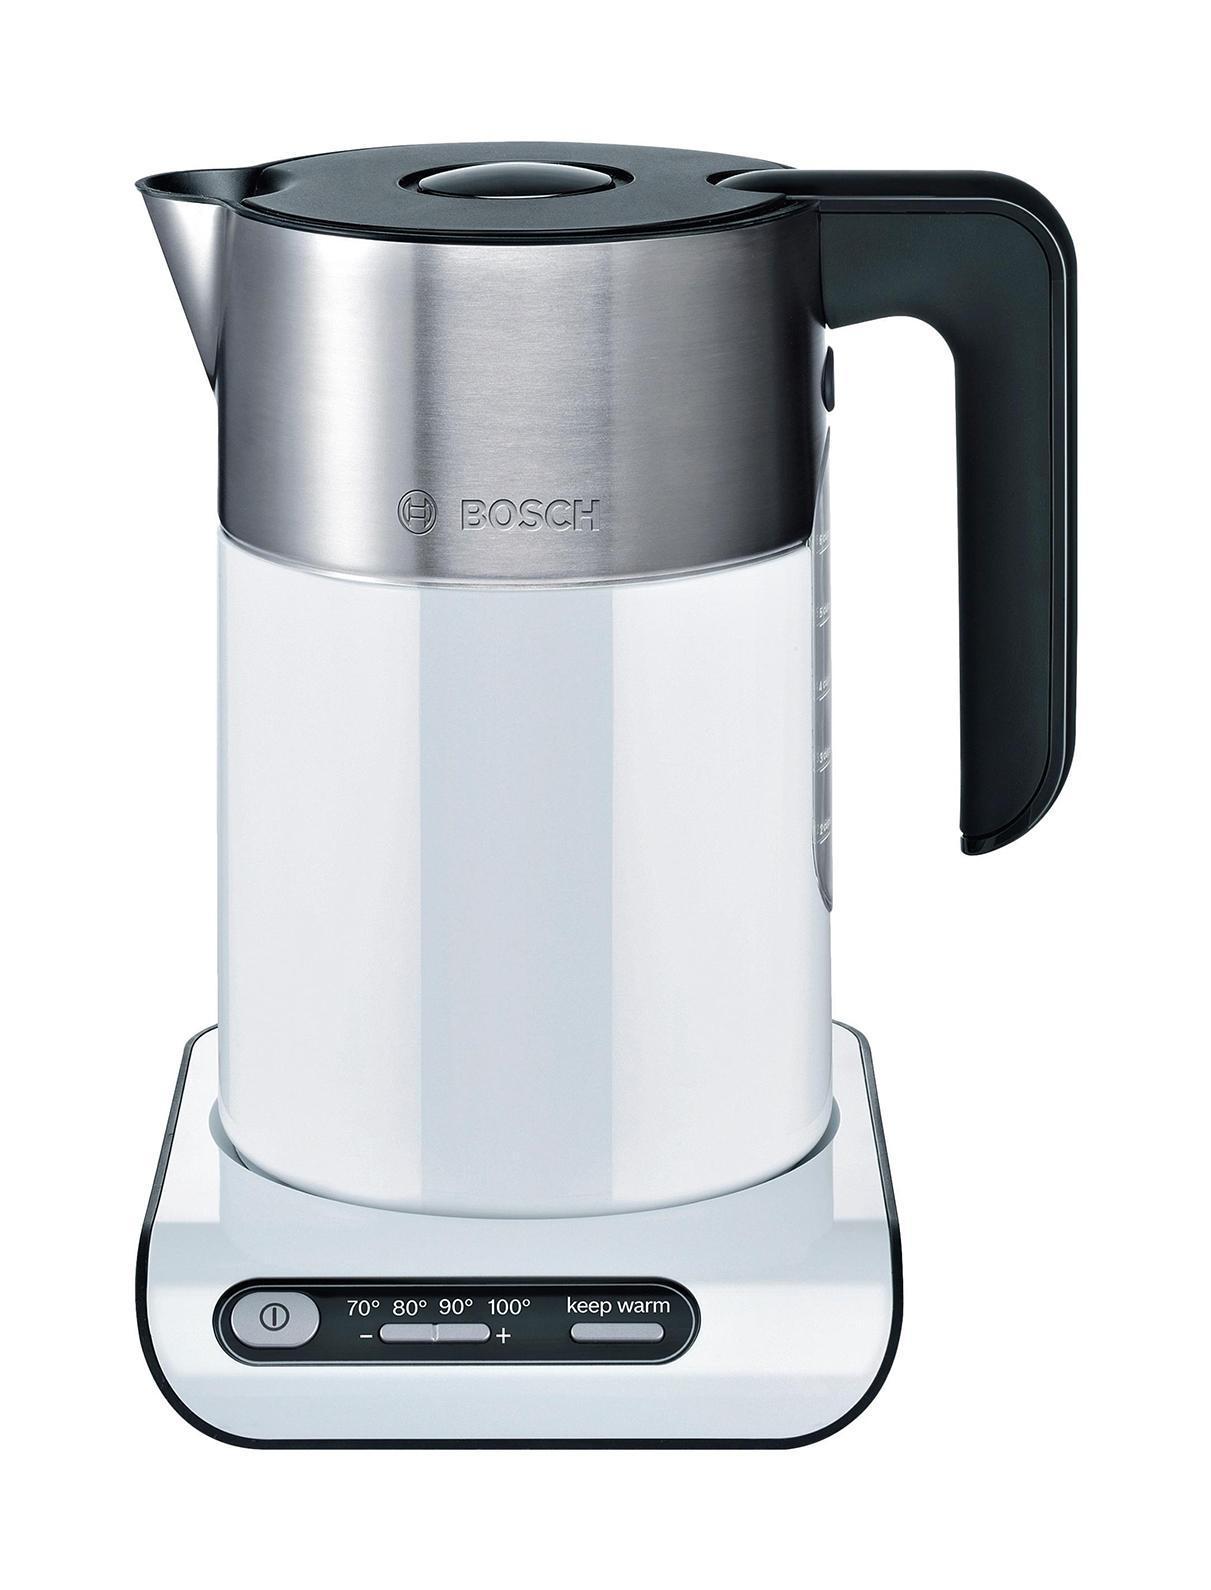 Bosch TWK 8611, электрочайник чайник электрический bosch twk 8611